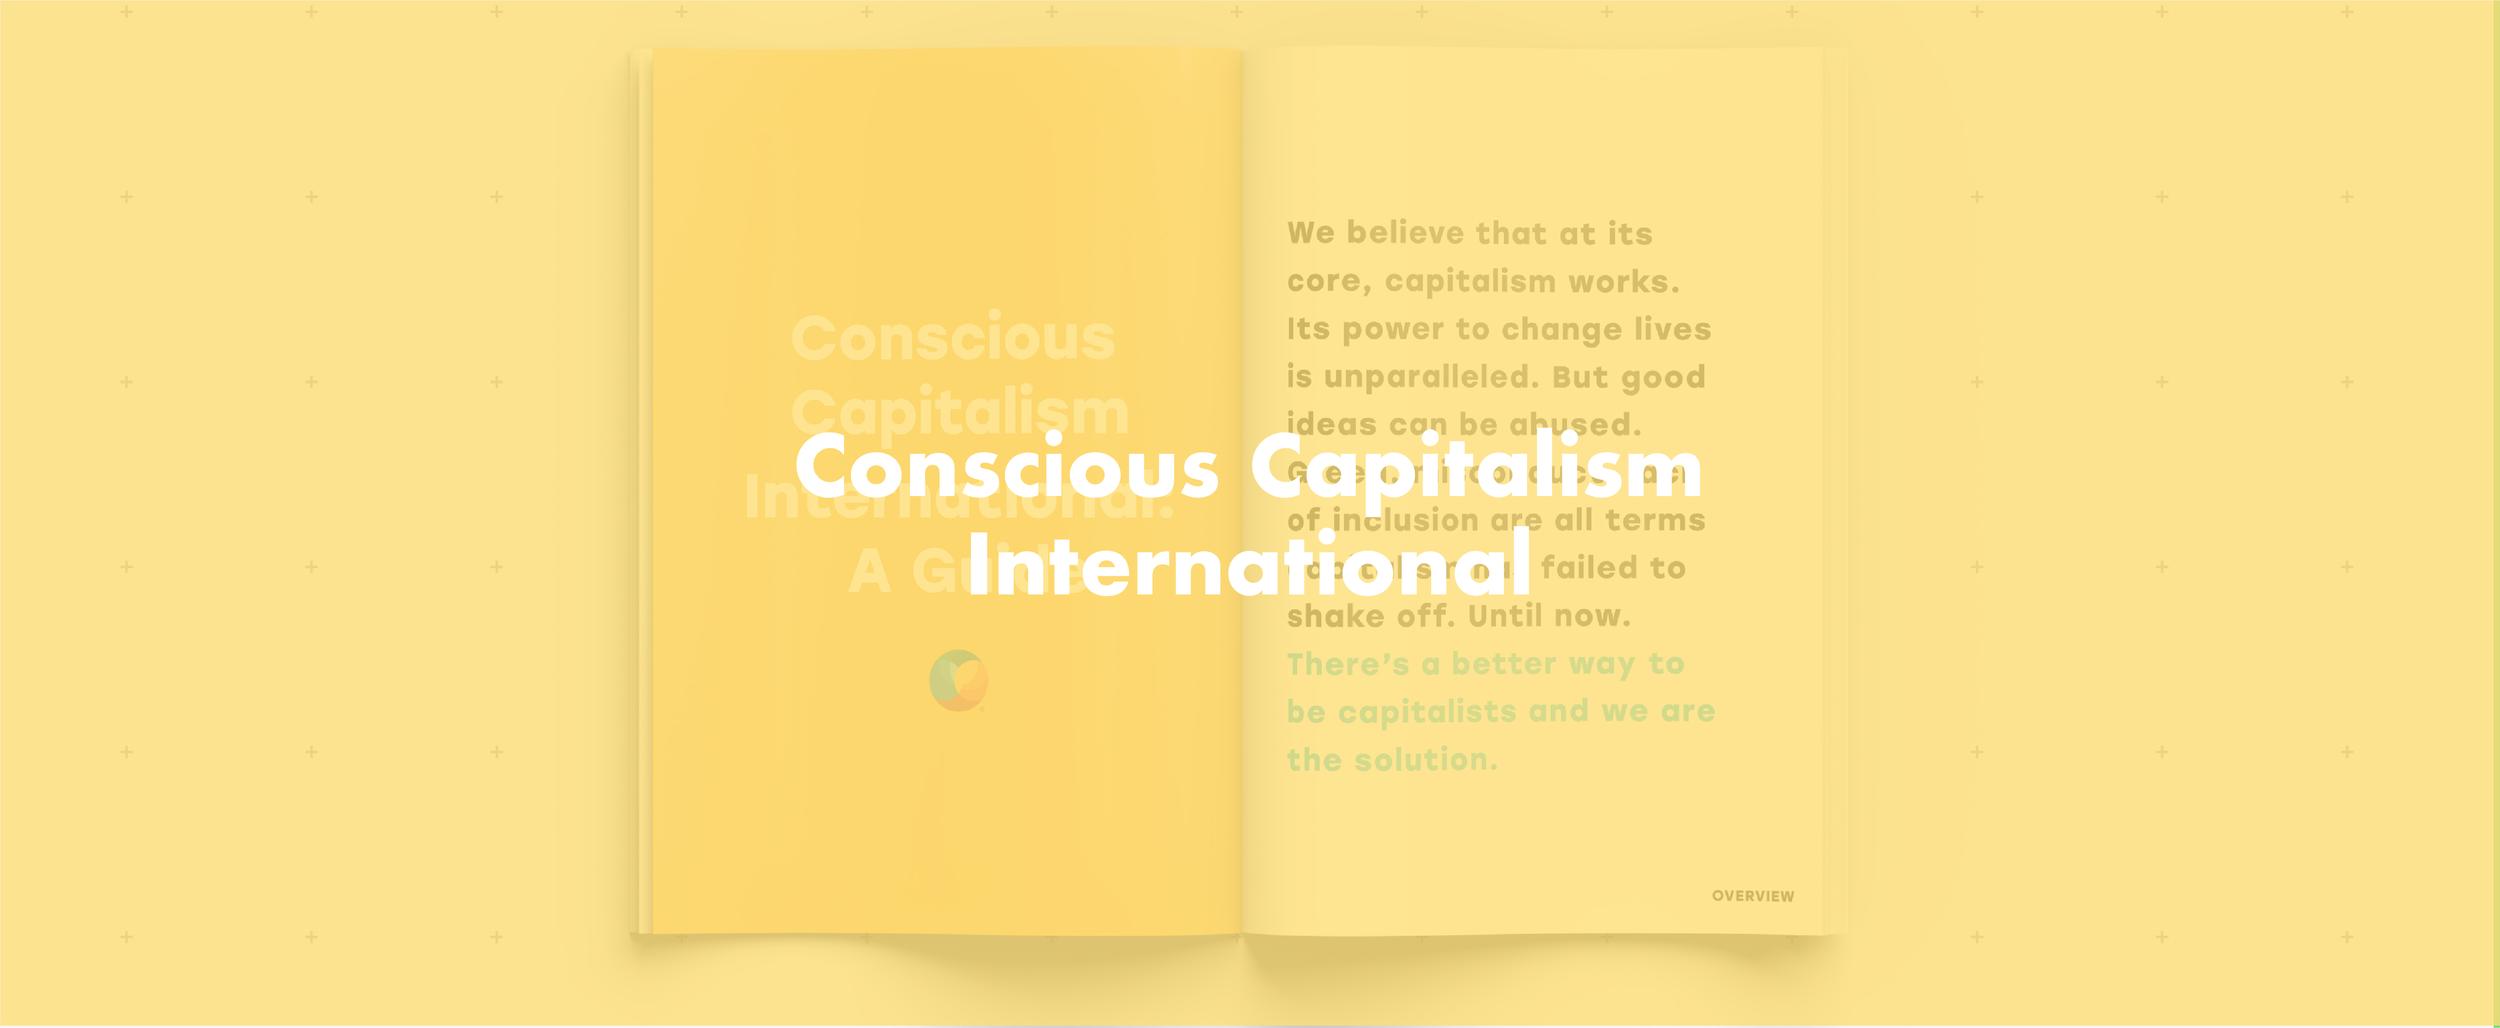 conscious capitalism international-10.png